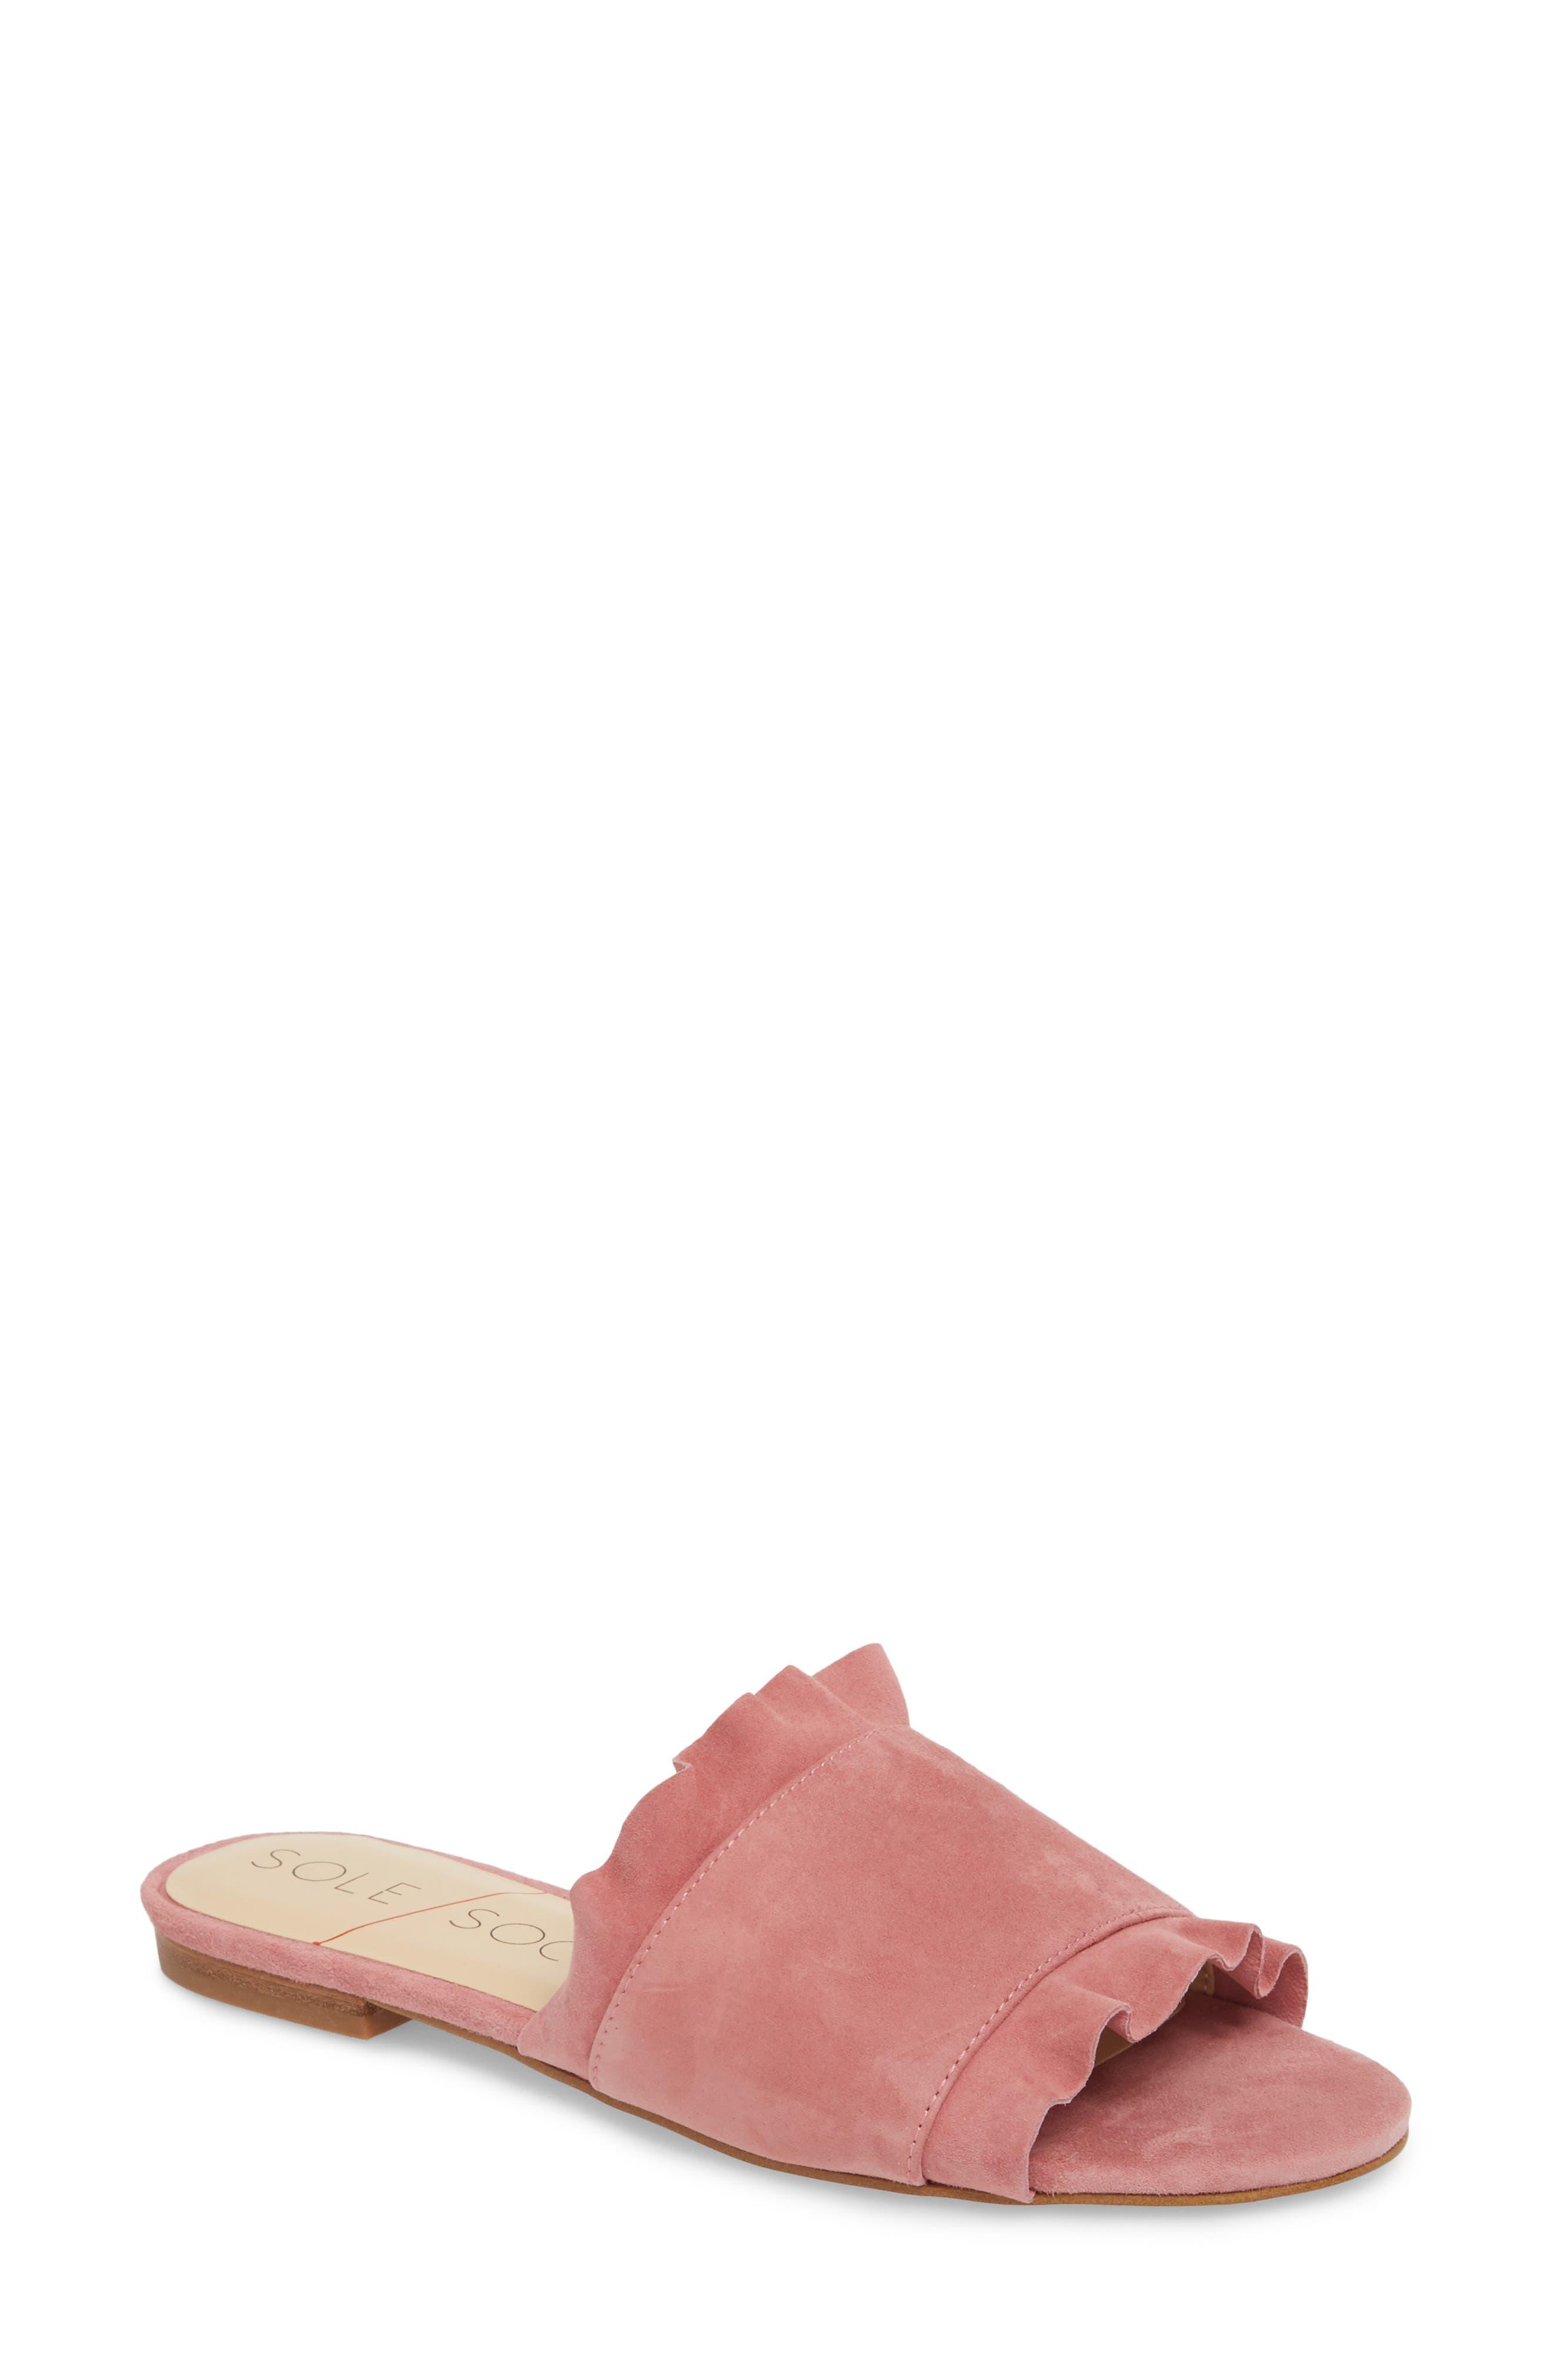 So-Madalayne Flat Sandal,                         Main,                         color, 658